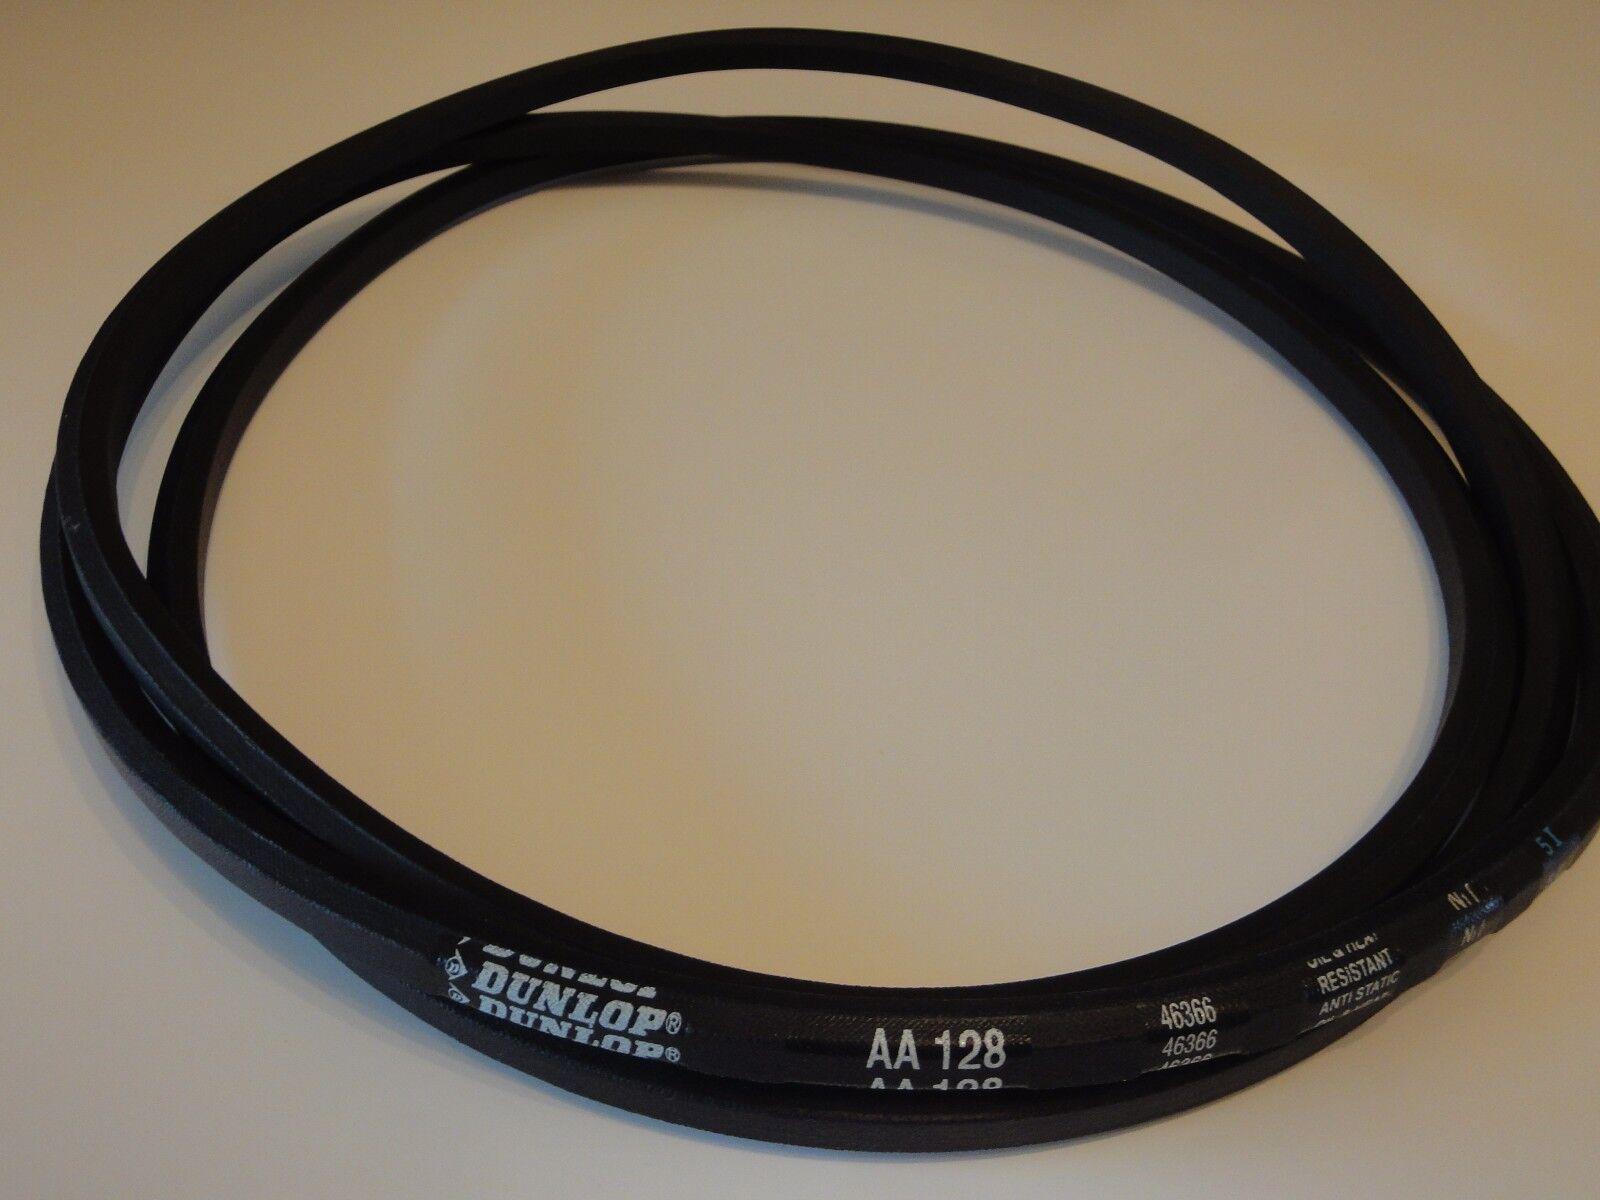 AA112 Dunlop Quality Hexagonal Mower Agricultural V Vee Belt